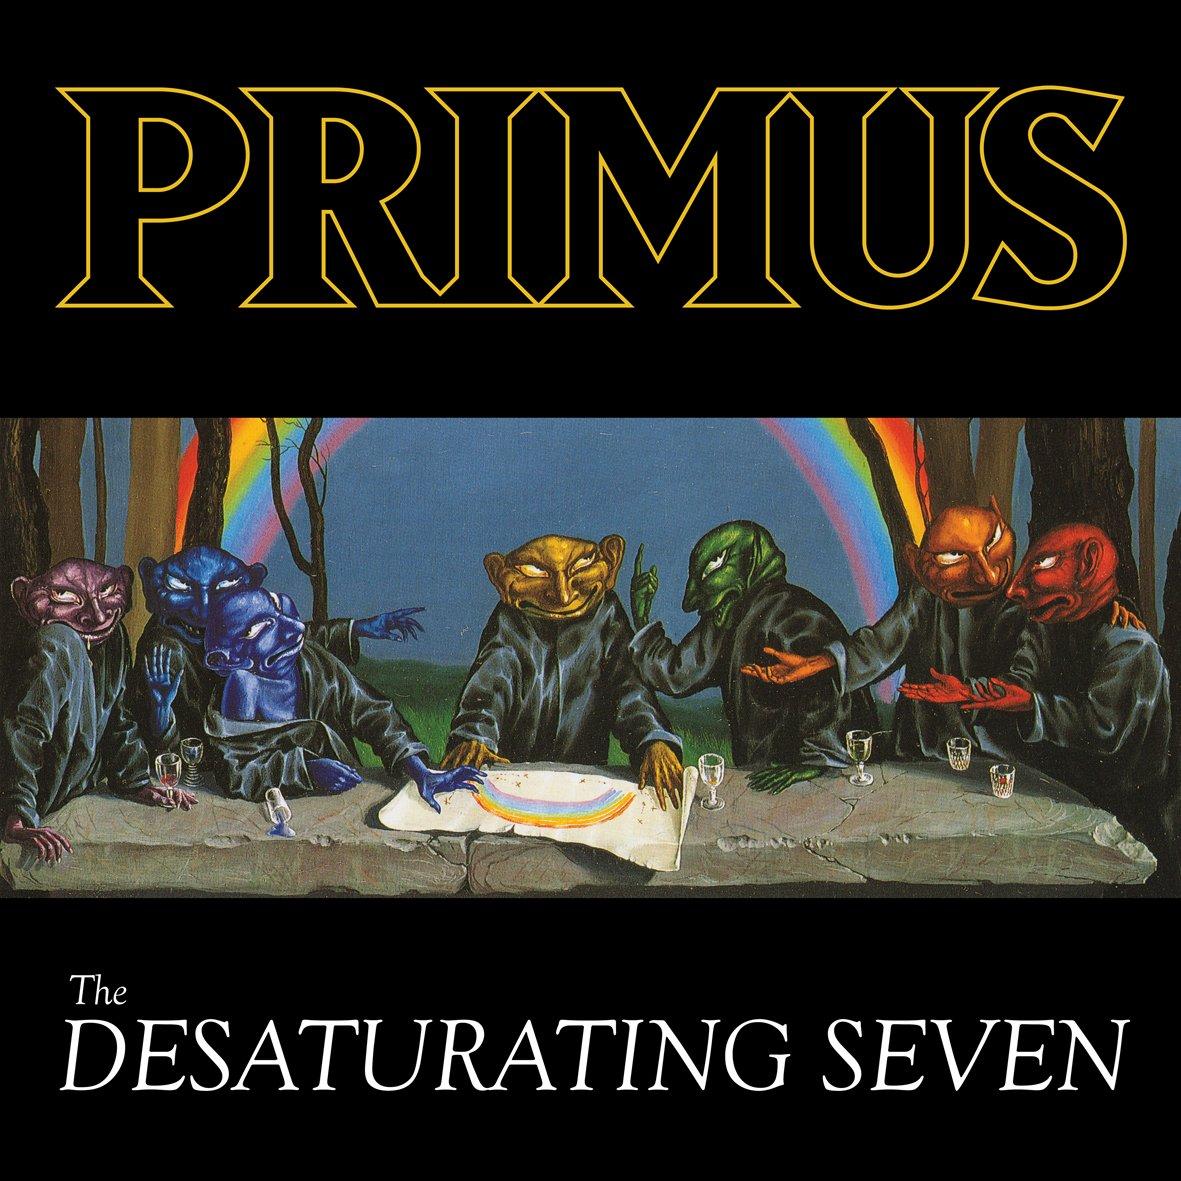 Primus - The Desaturating Seven (2017) [FLAC] Download